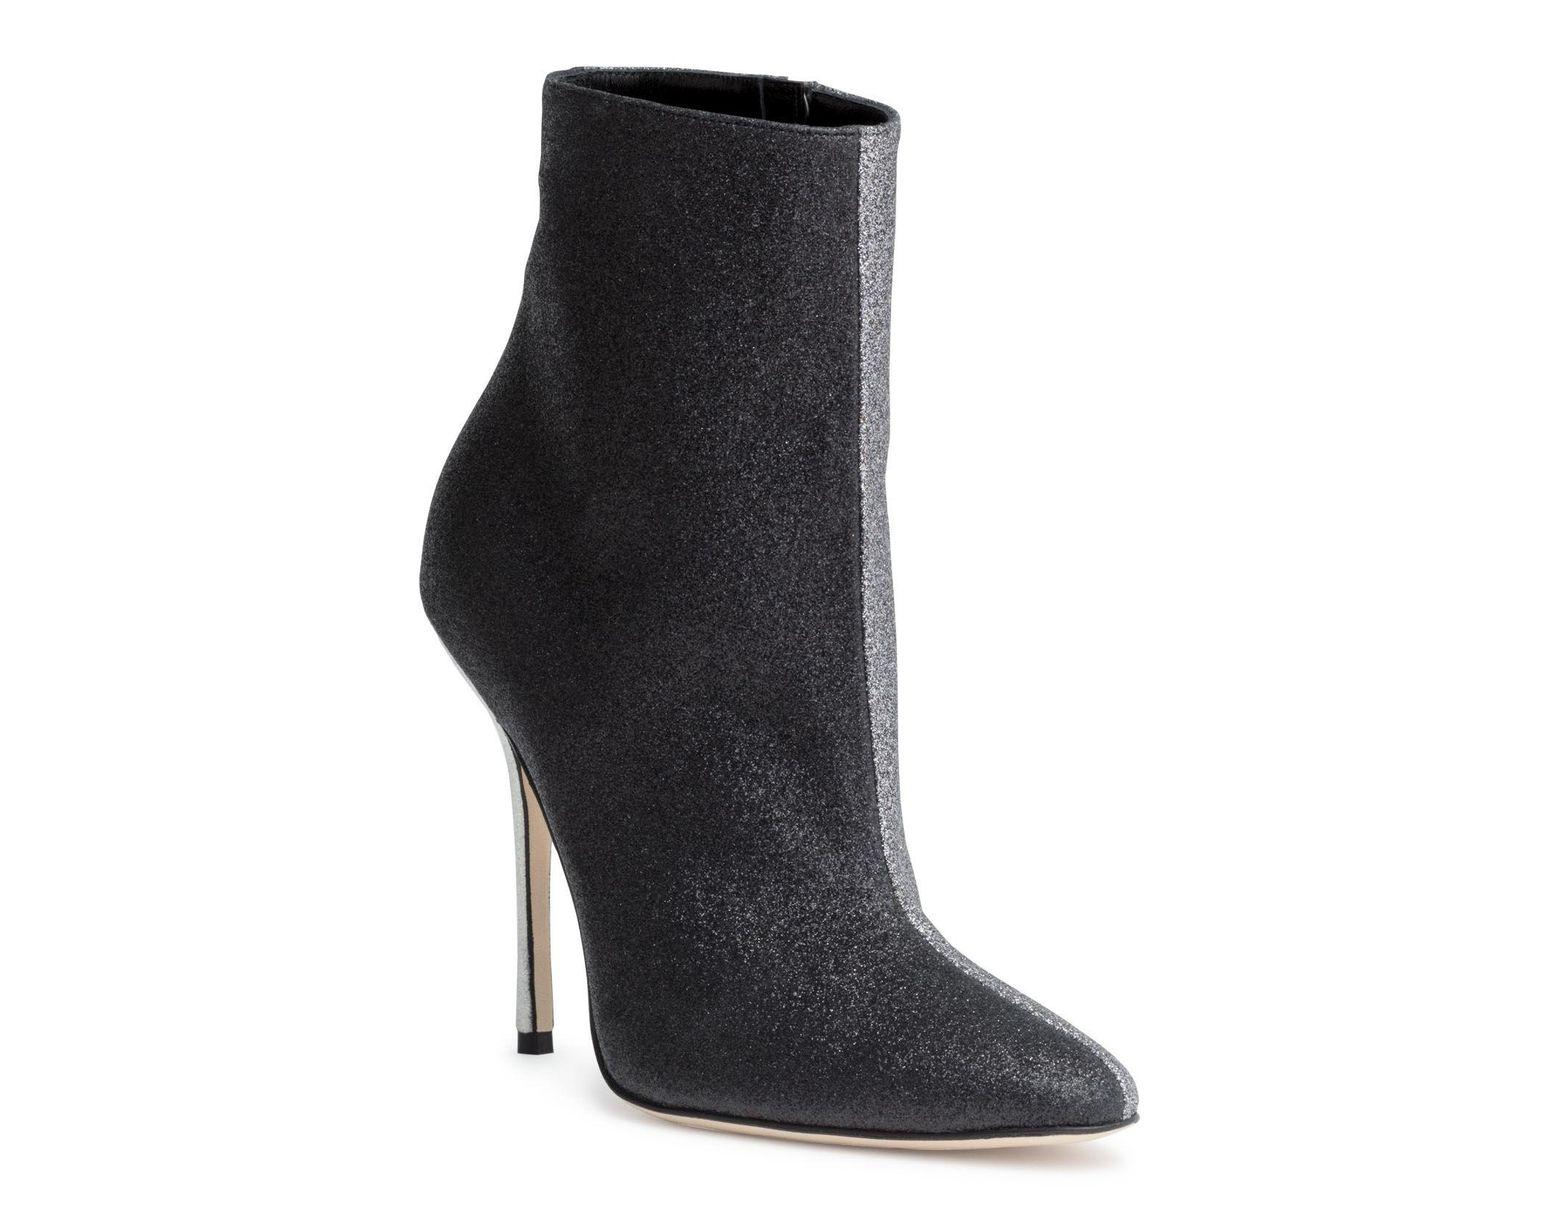 050b224daa79a Manolo Blahnik Insopolobi 115 Two Tone Glitter Boots in Black - Lyst